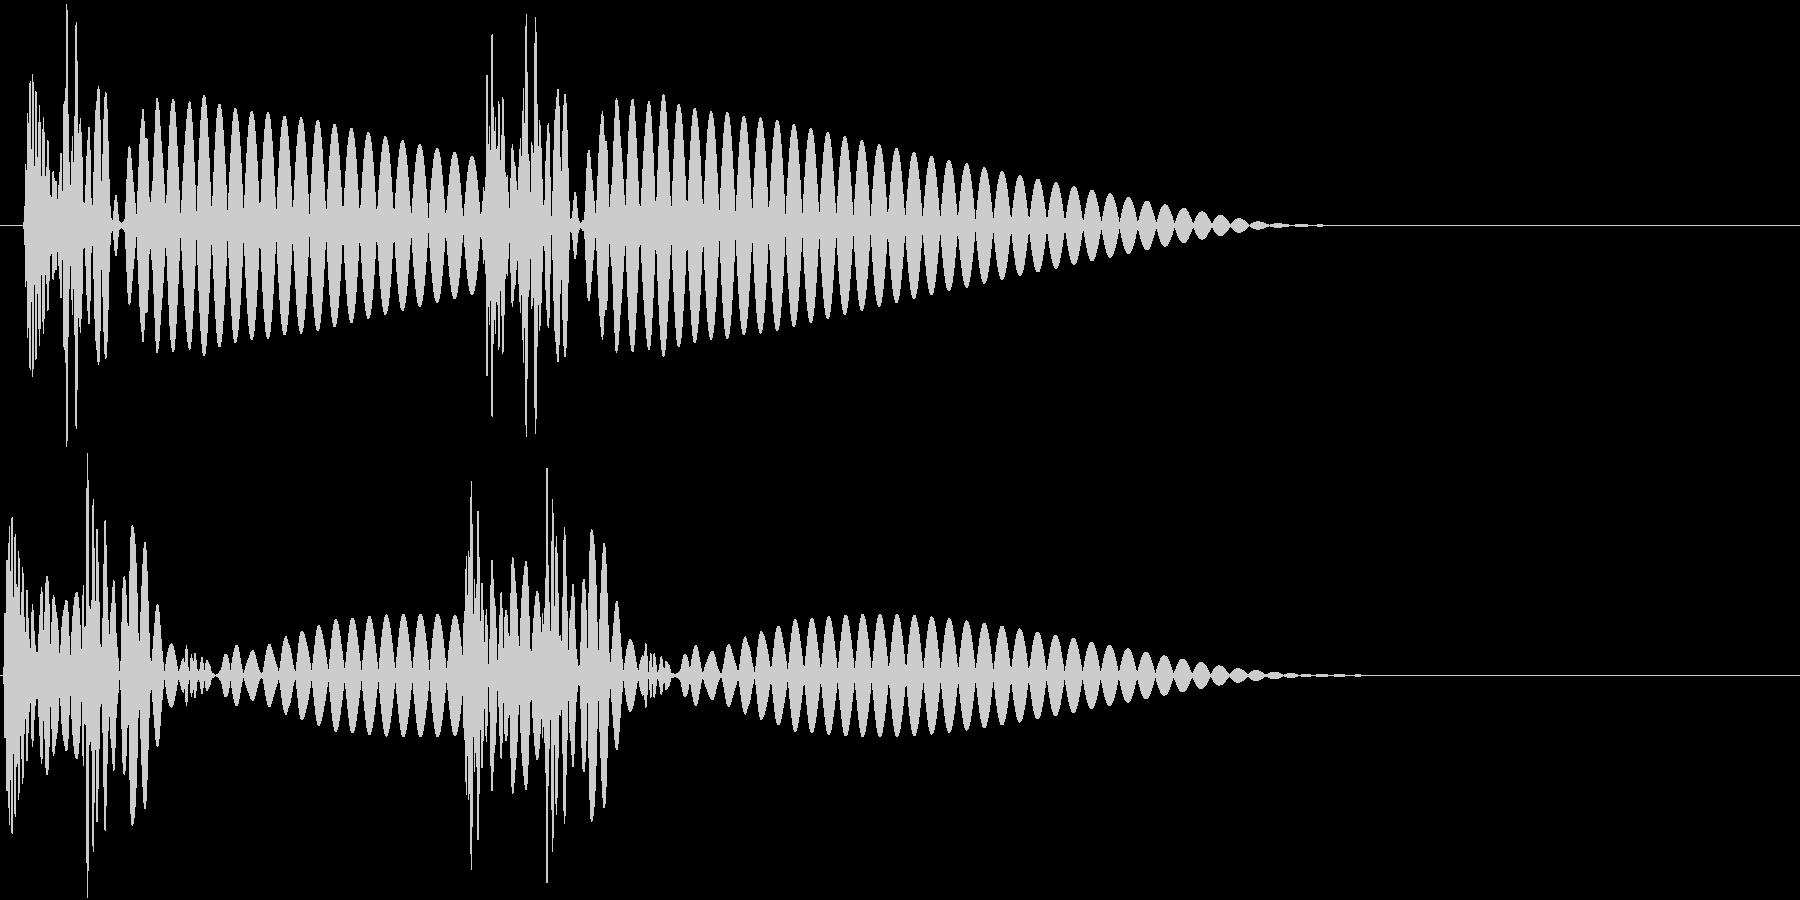 HeartBeat 心臓の音 4 単発の未再生の波形